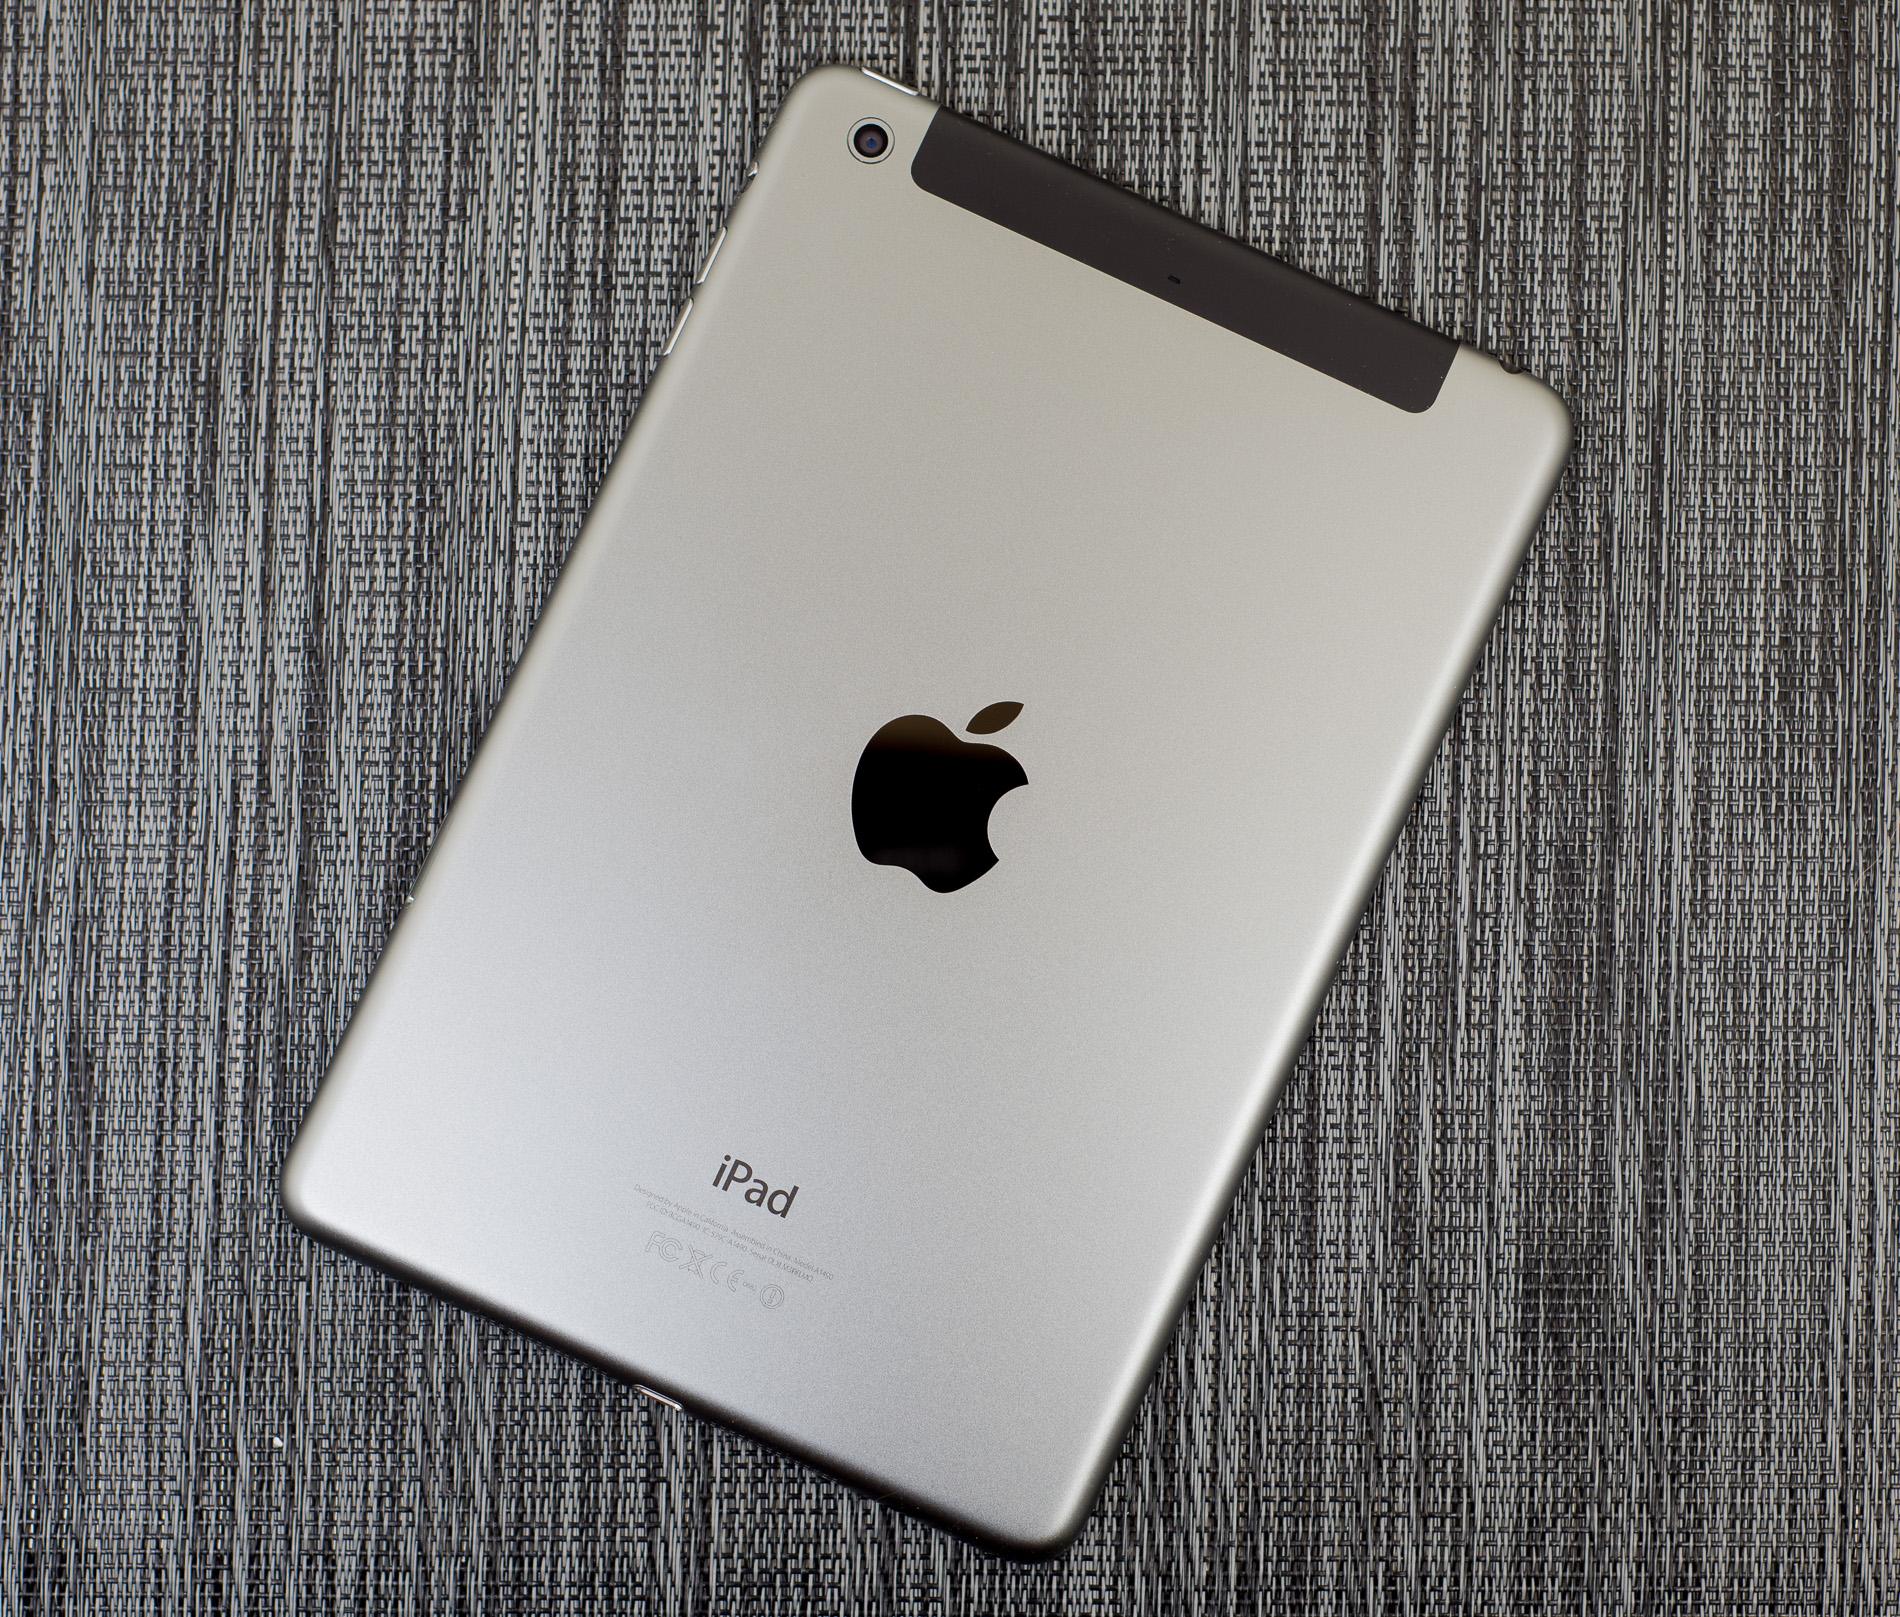 Apple iPad mini with Retina Display: Reviewed